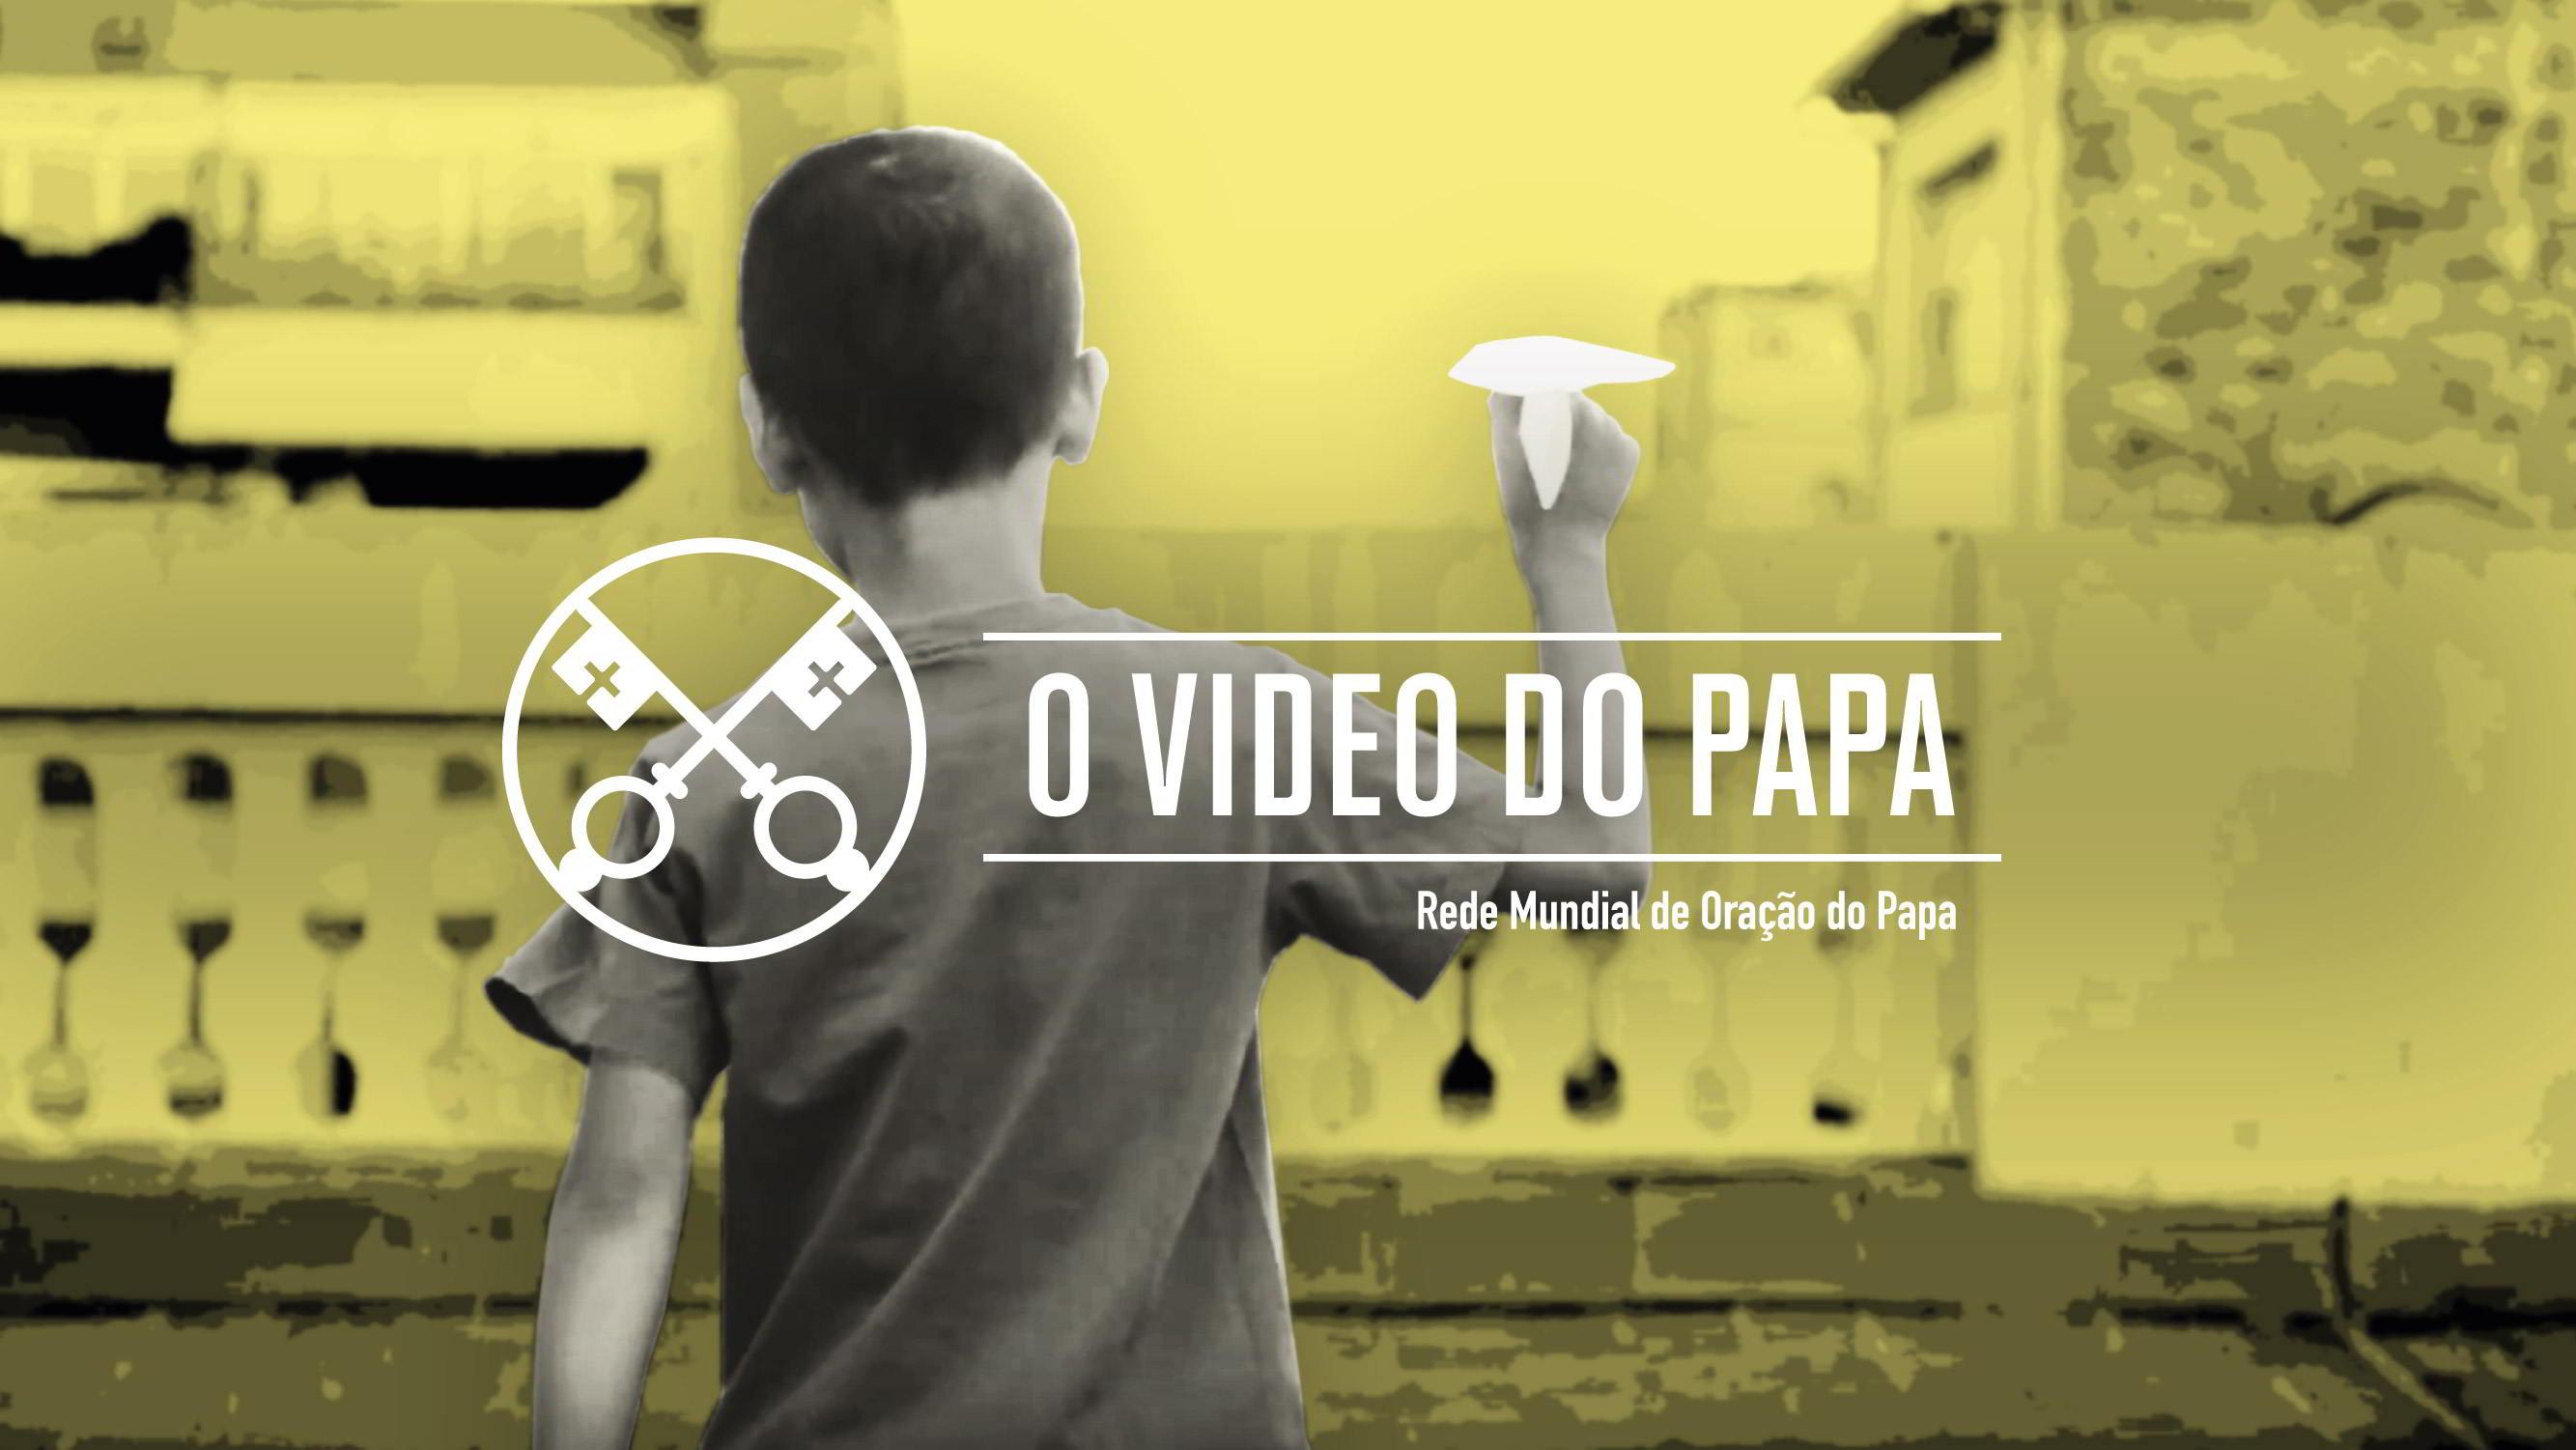 Official-Image-TPV-10-2019-PT-O-Video-do-Papa-Primavera-missionaria-na-Igreja